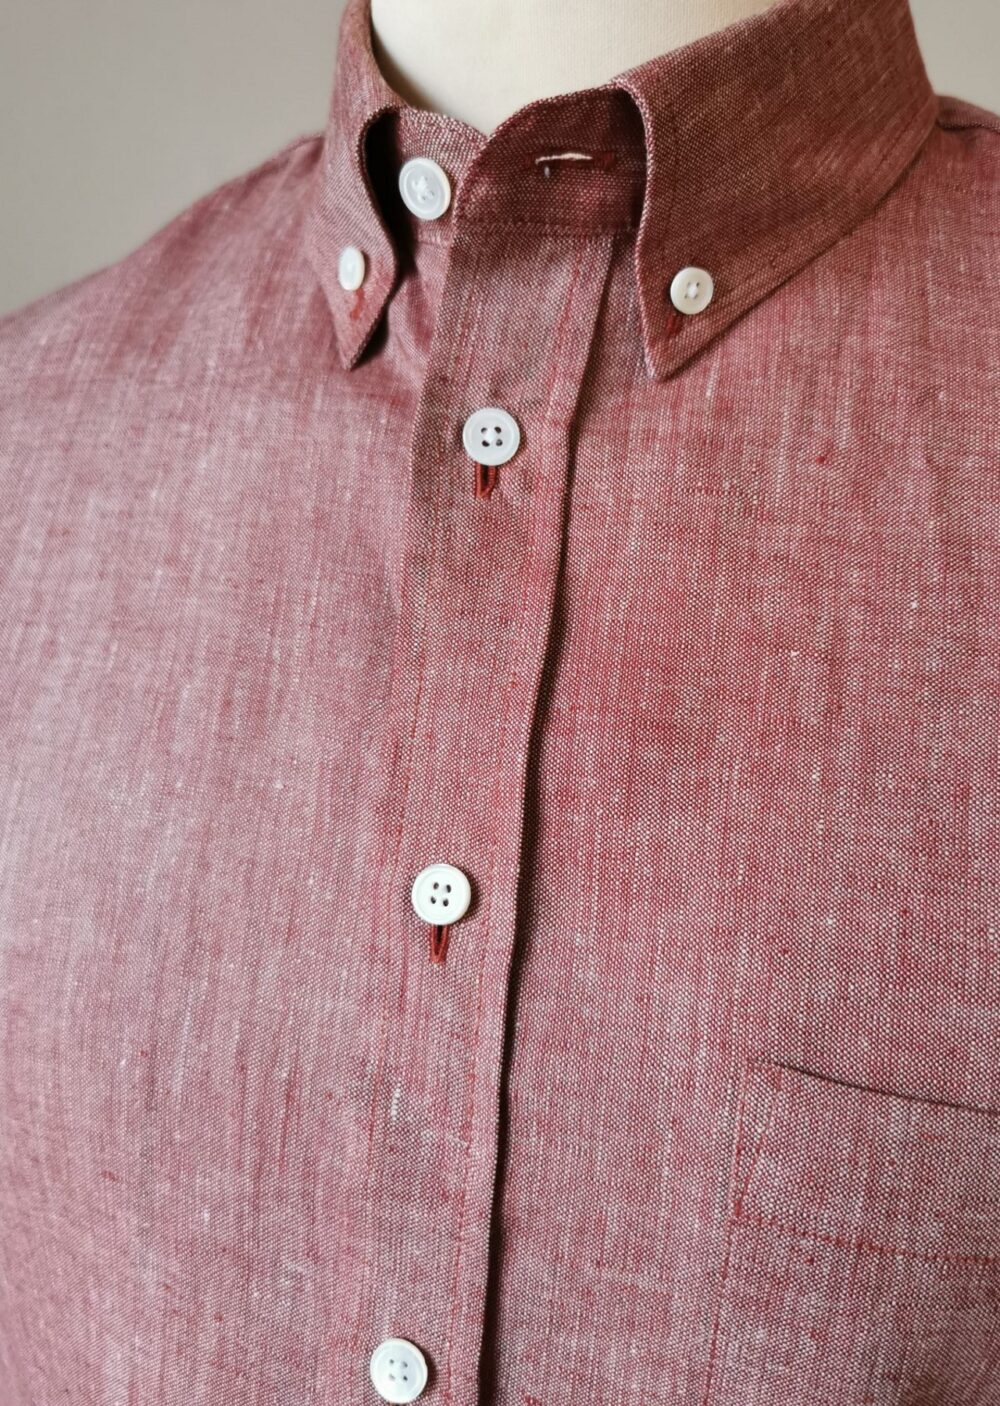 Hanf-Leinen-Hemd wein-rot